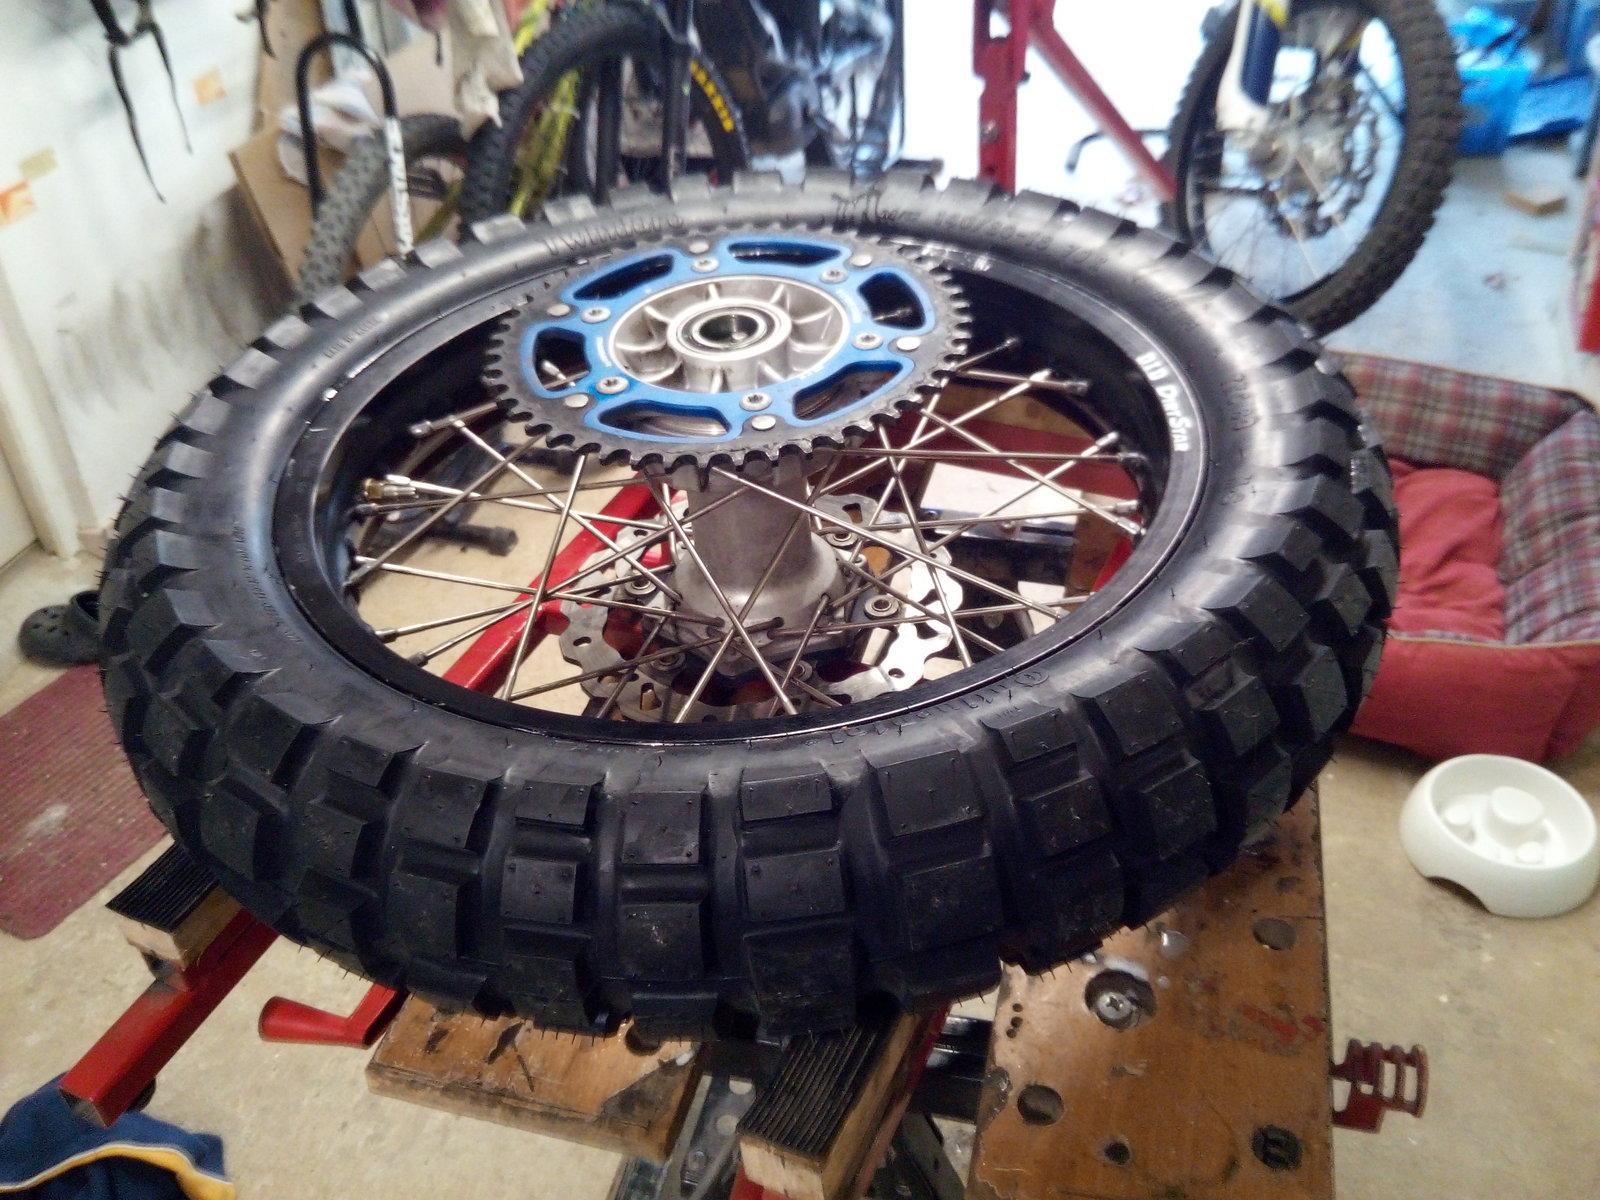 améliorations Husqvarna 701 enduro ET KTM 690 enduro - Page 6 20102604332313284